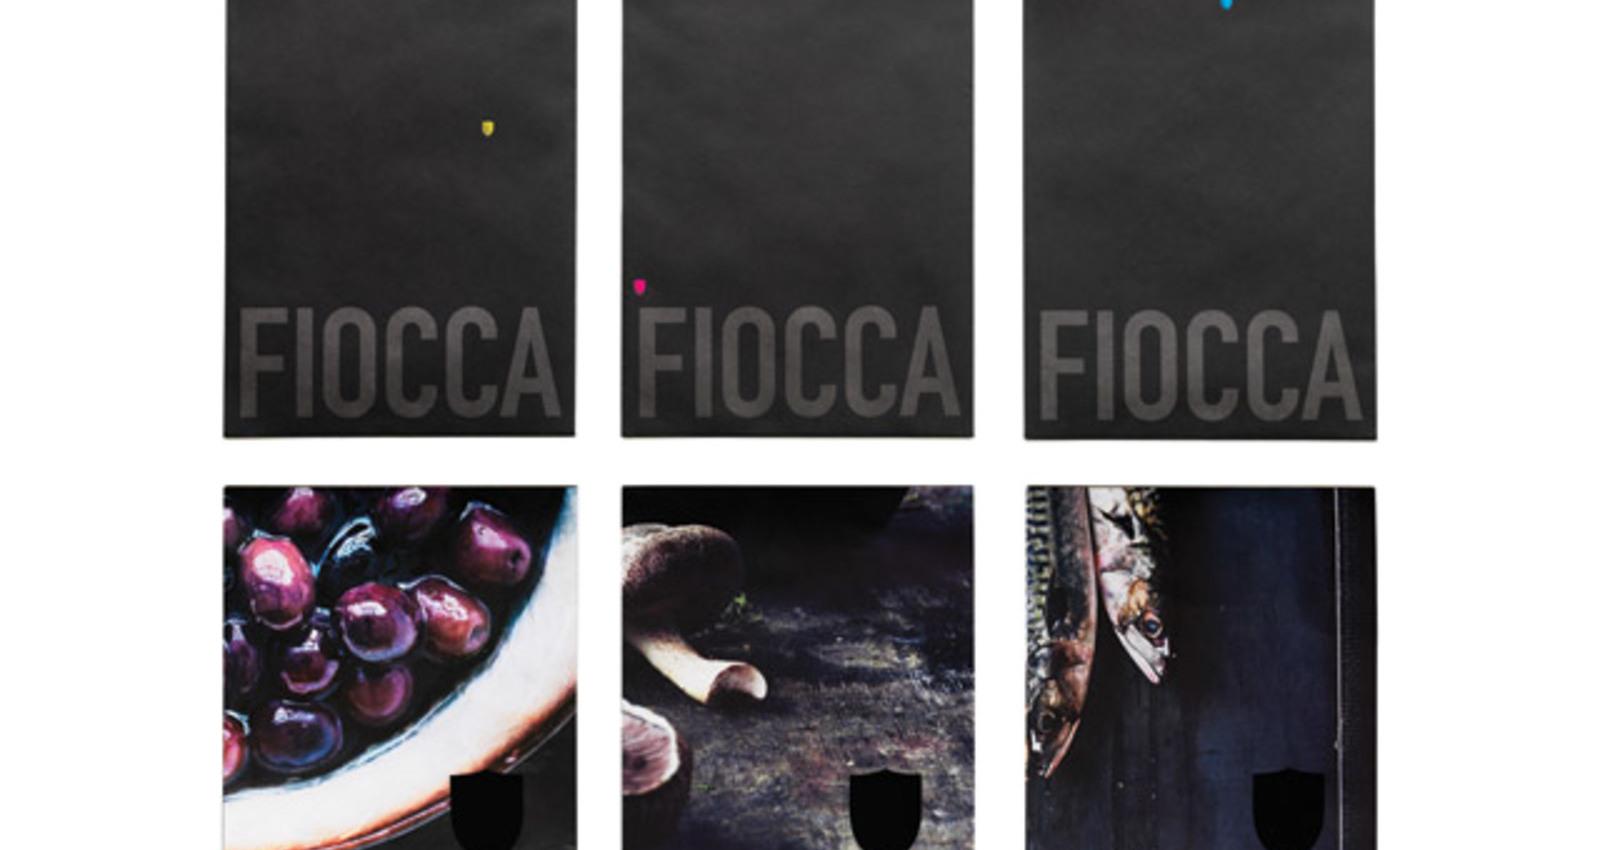 Fiocca Brand Identity Program